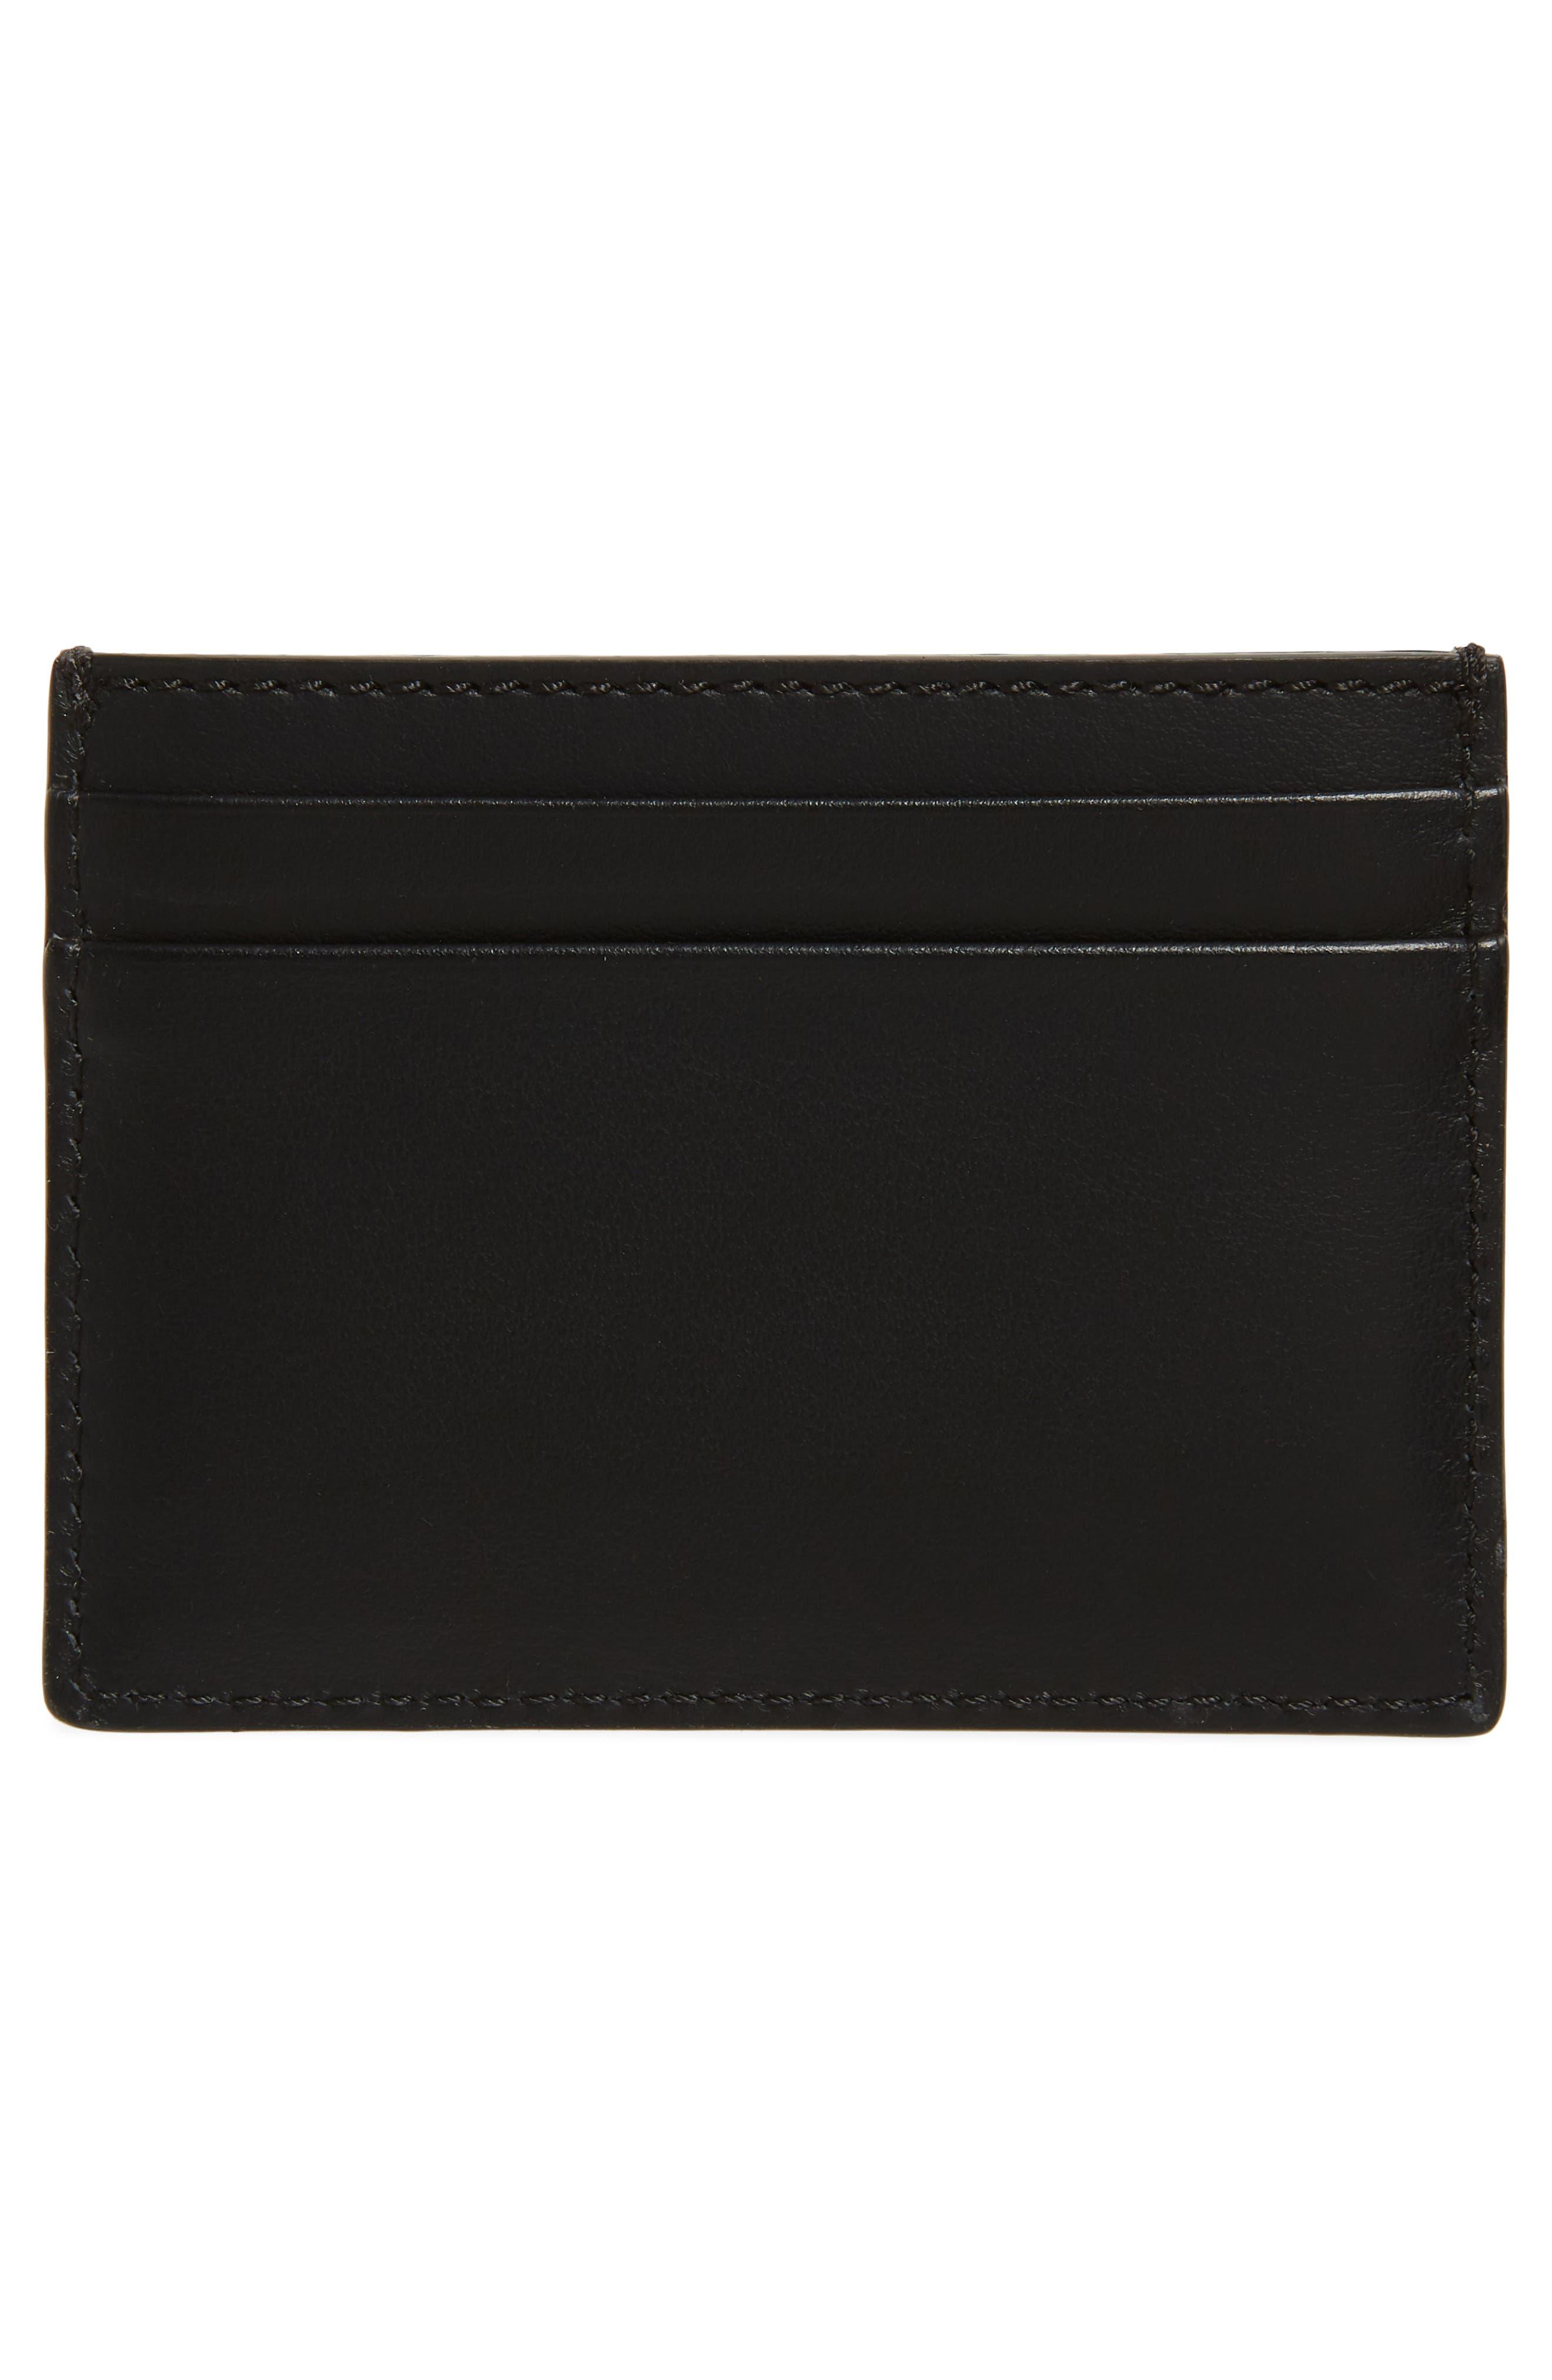 BURBERRY, Sandon Logo Leather Card Case, Alternate thumbnail 2, color, BLACK